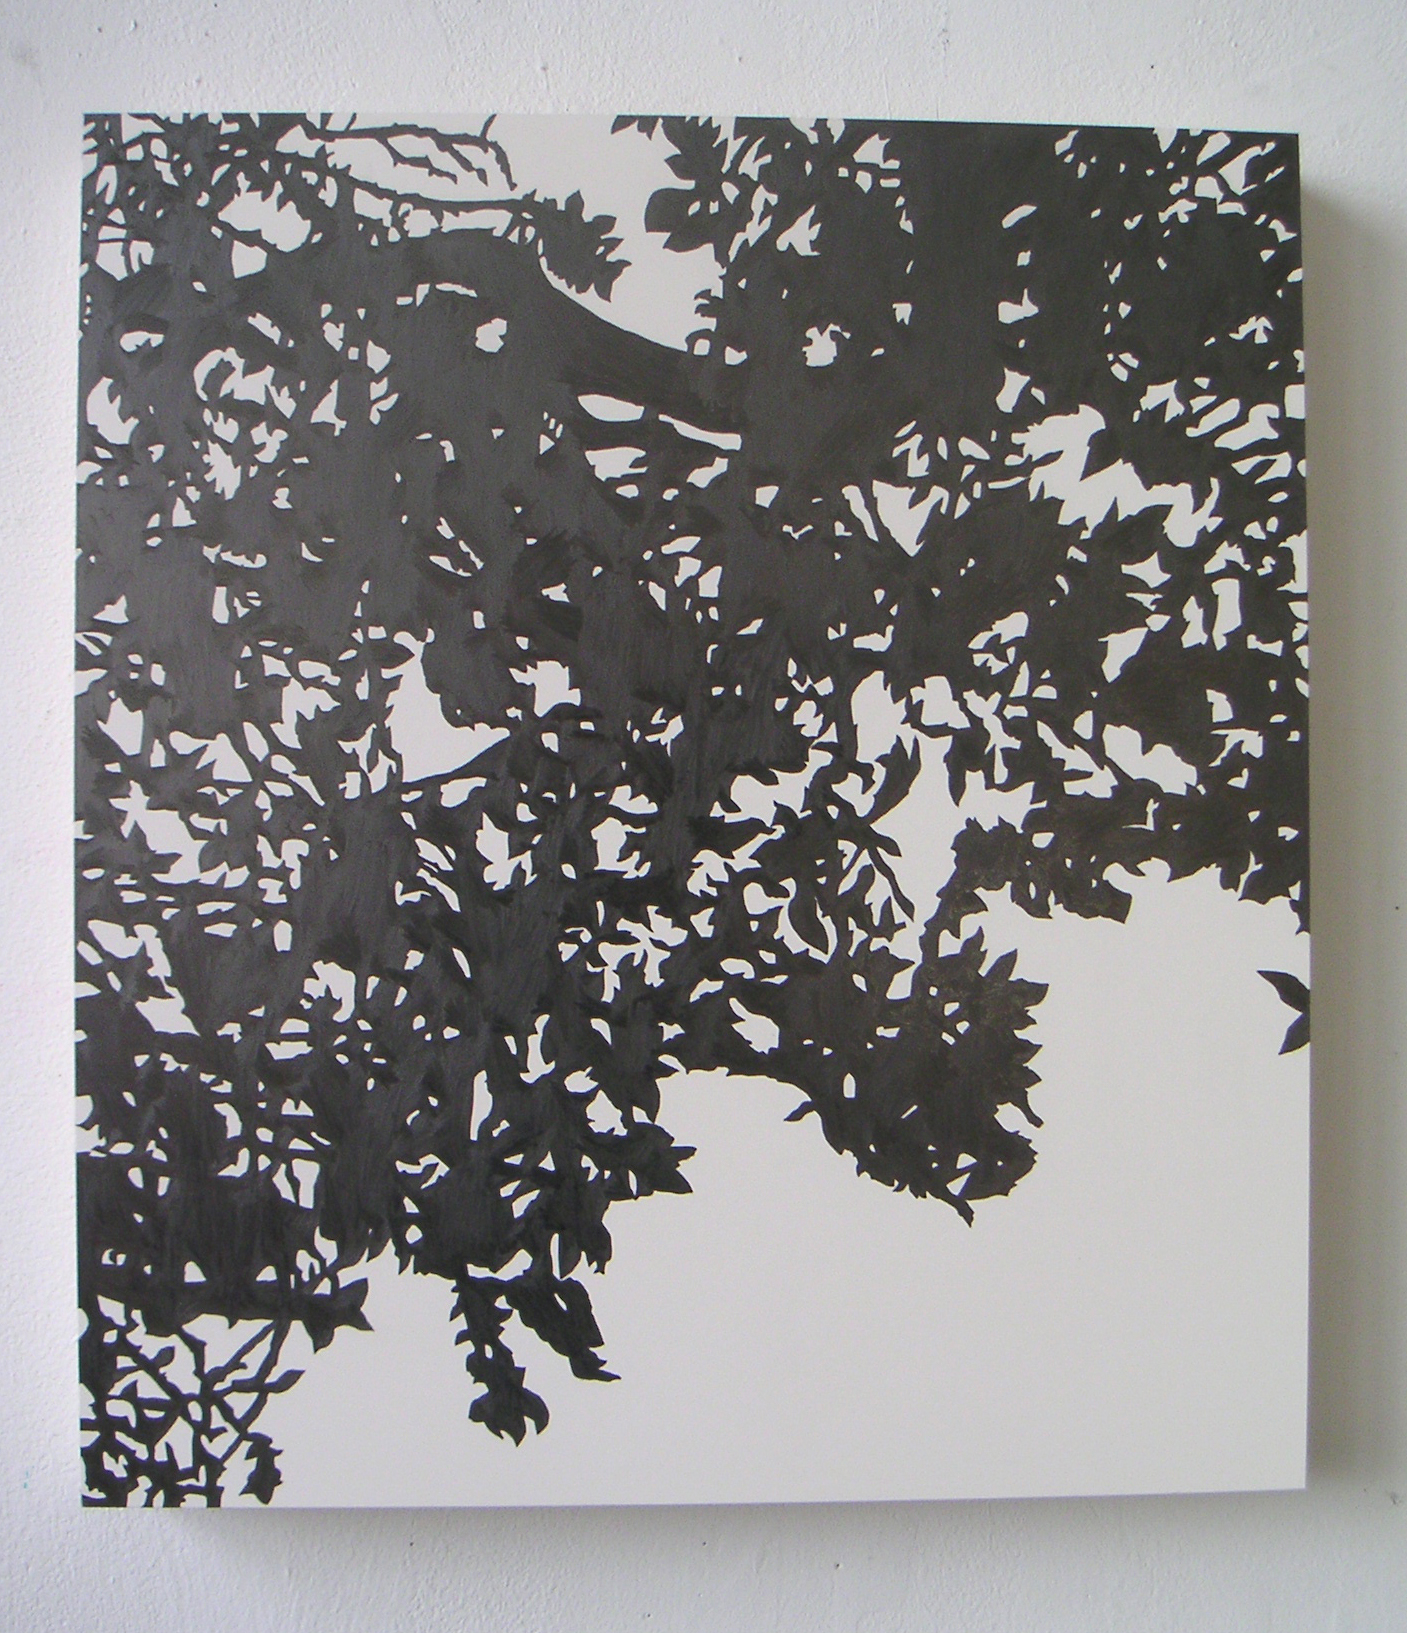 "Shogetsu (03), 2005 Pencil on clayboard panel 20"" x 16"" SOLD"